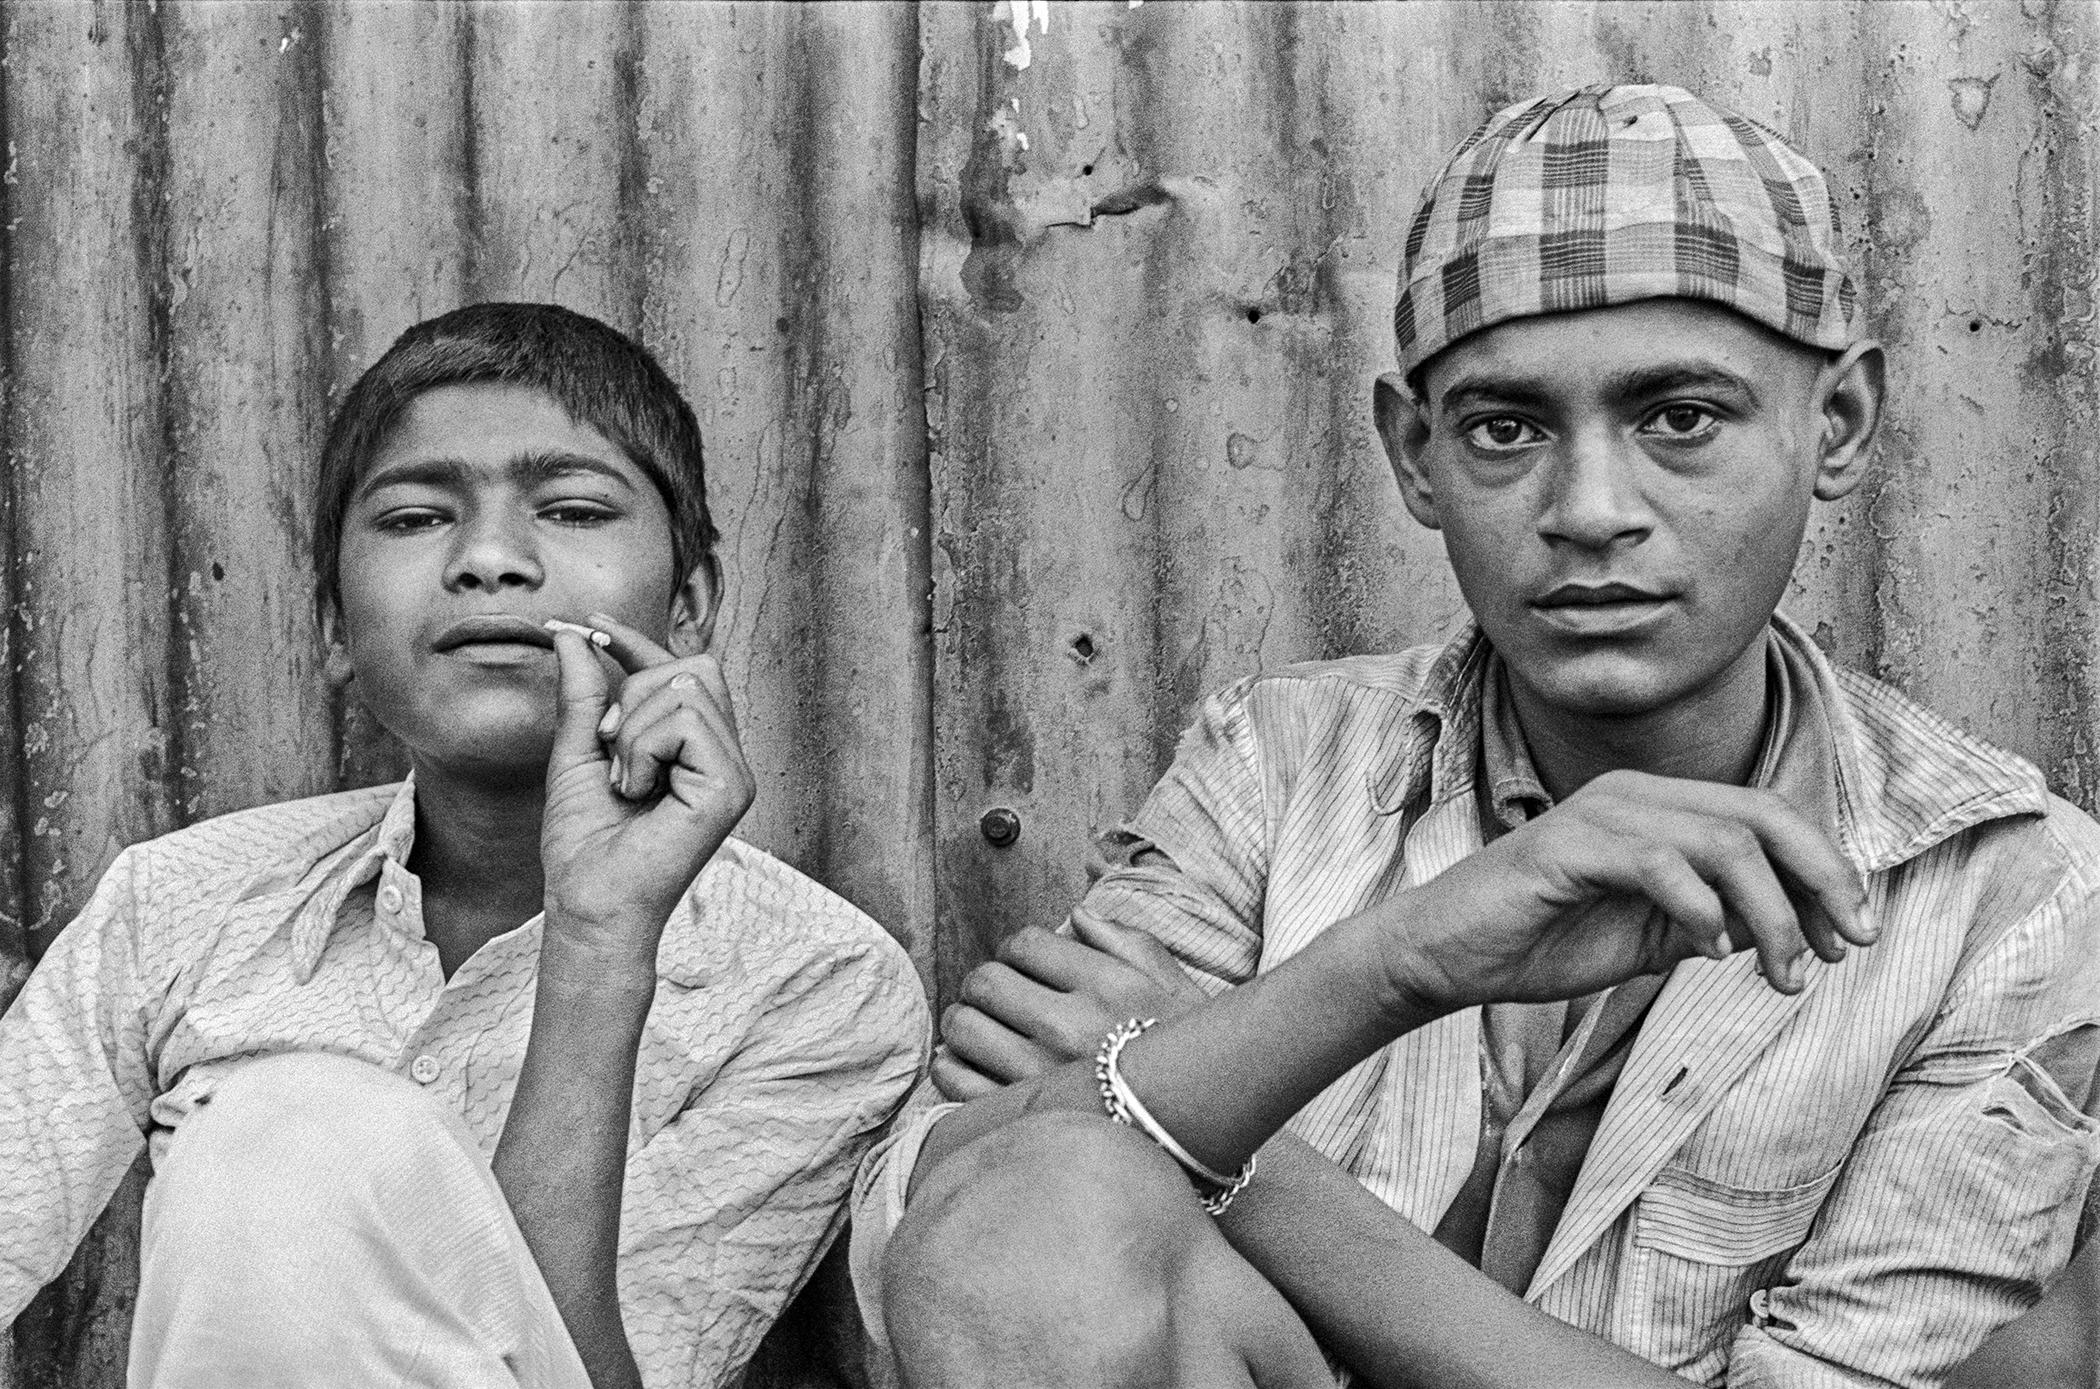 Salim and Tukloo Bombay 1987 by Sooni Taraporevala